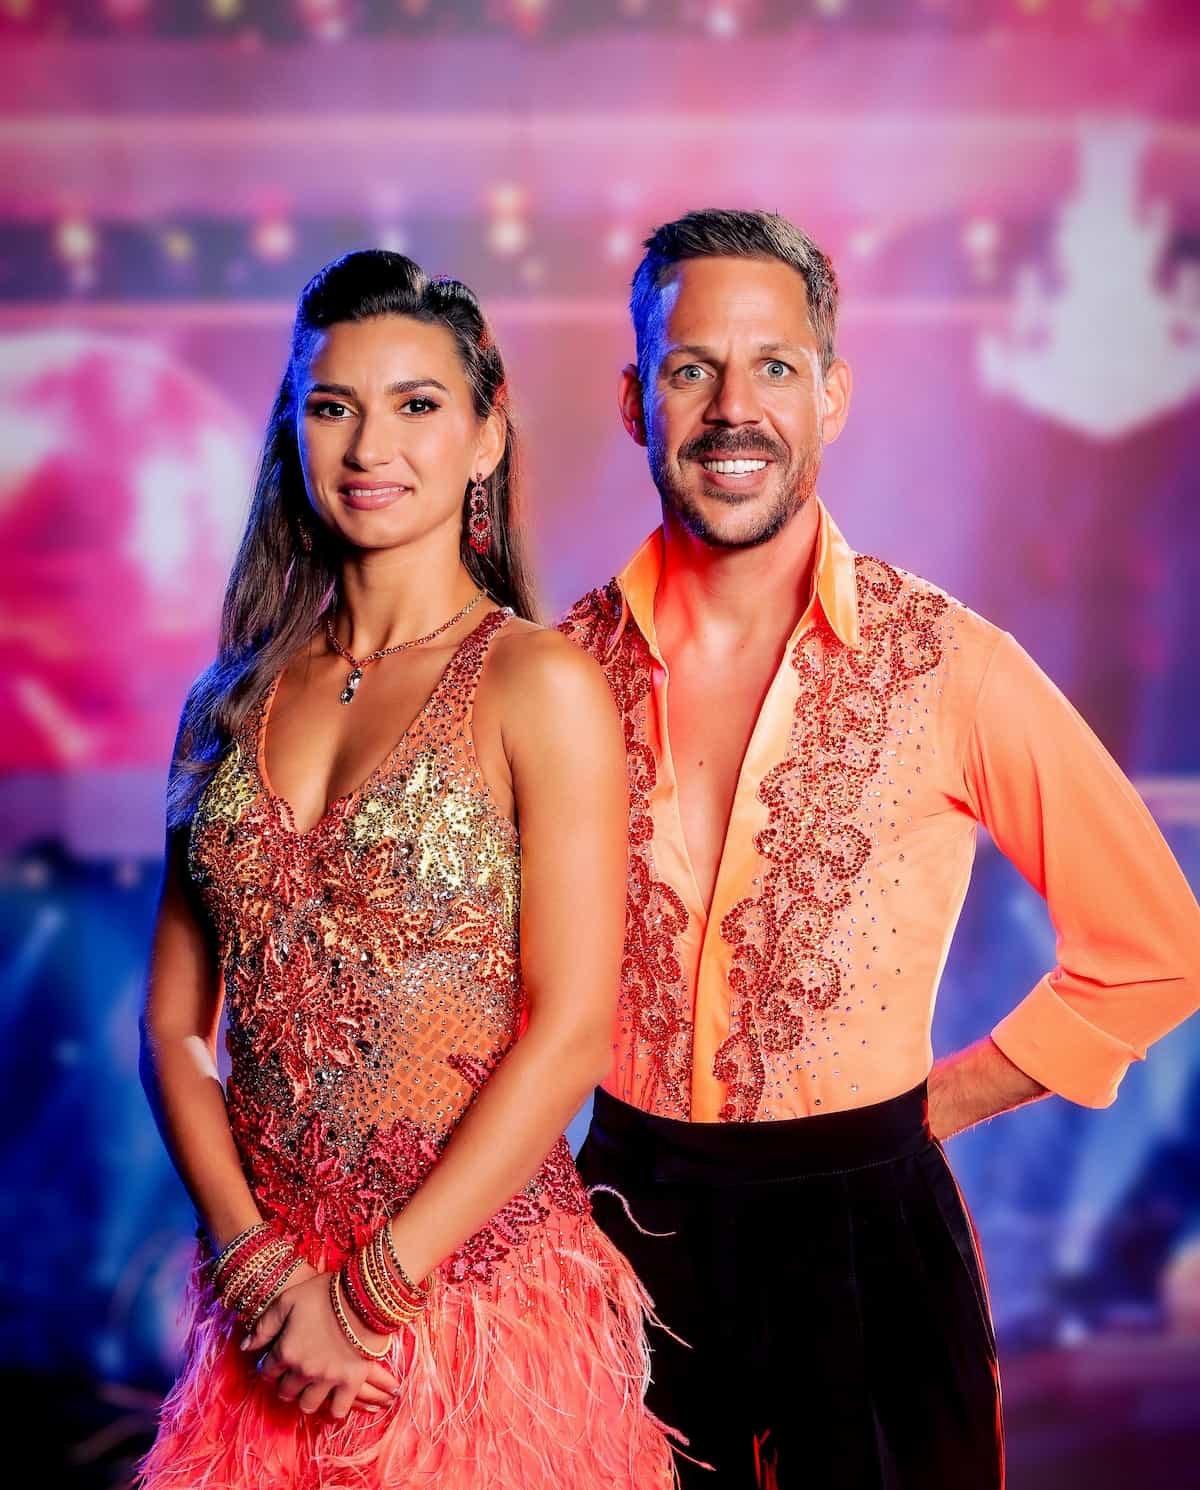 Bernhard Kohl - Vesela Dimova in der 1. Show Dancing Stars am 24.9.2021